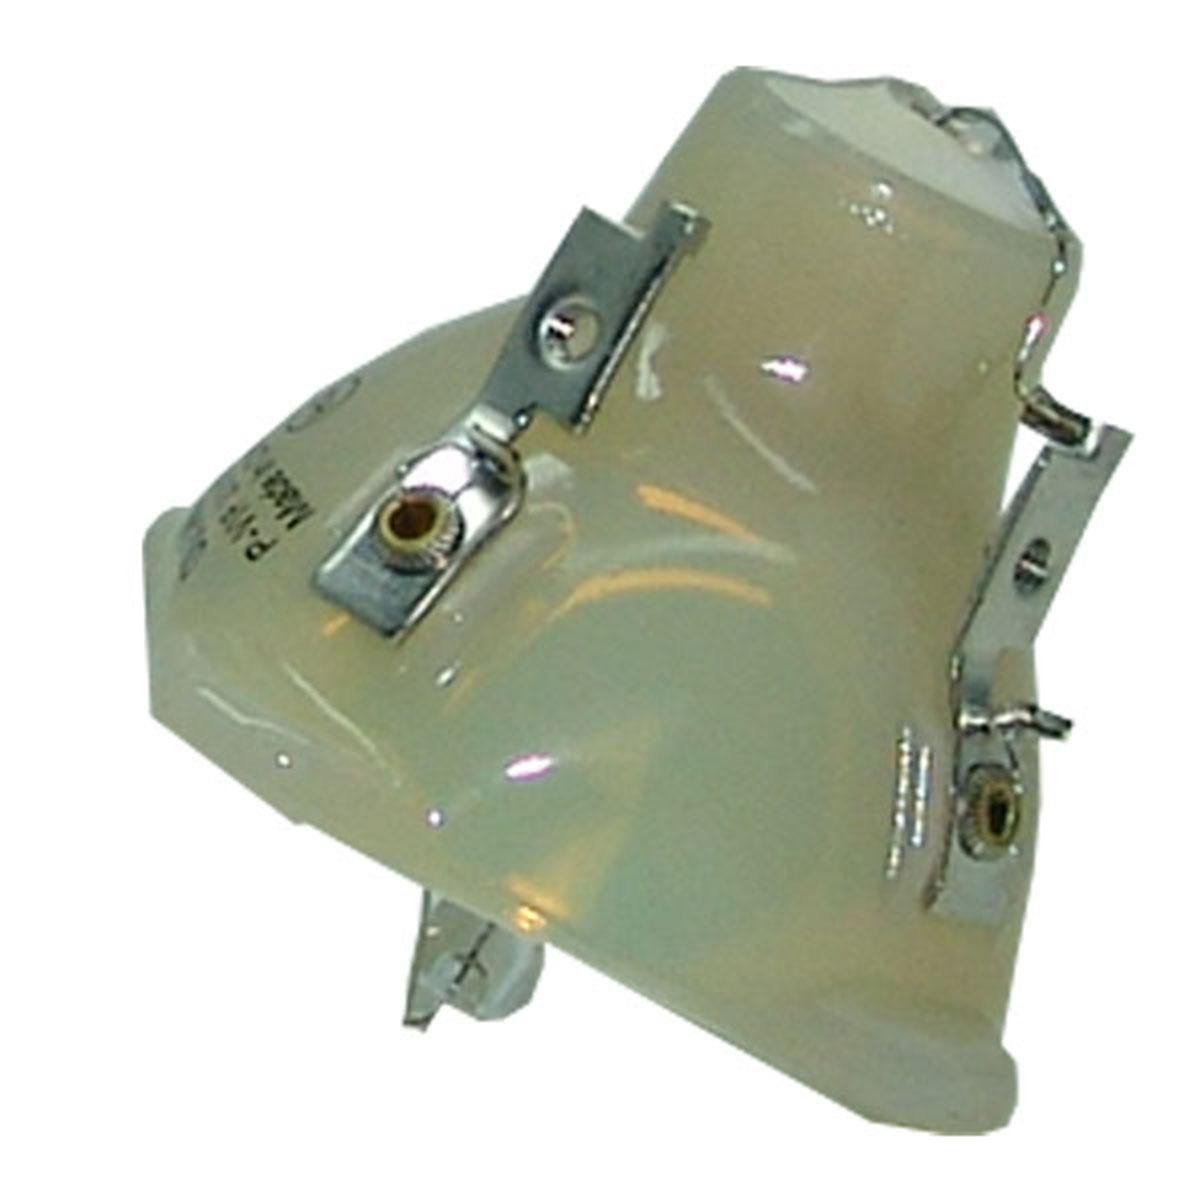 Original Osram Projector Lamp Replacement for Delta DP3616LAMP (Bulb Only) - image 1 de 5